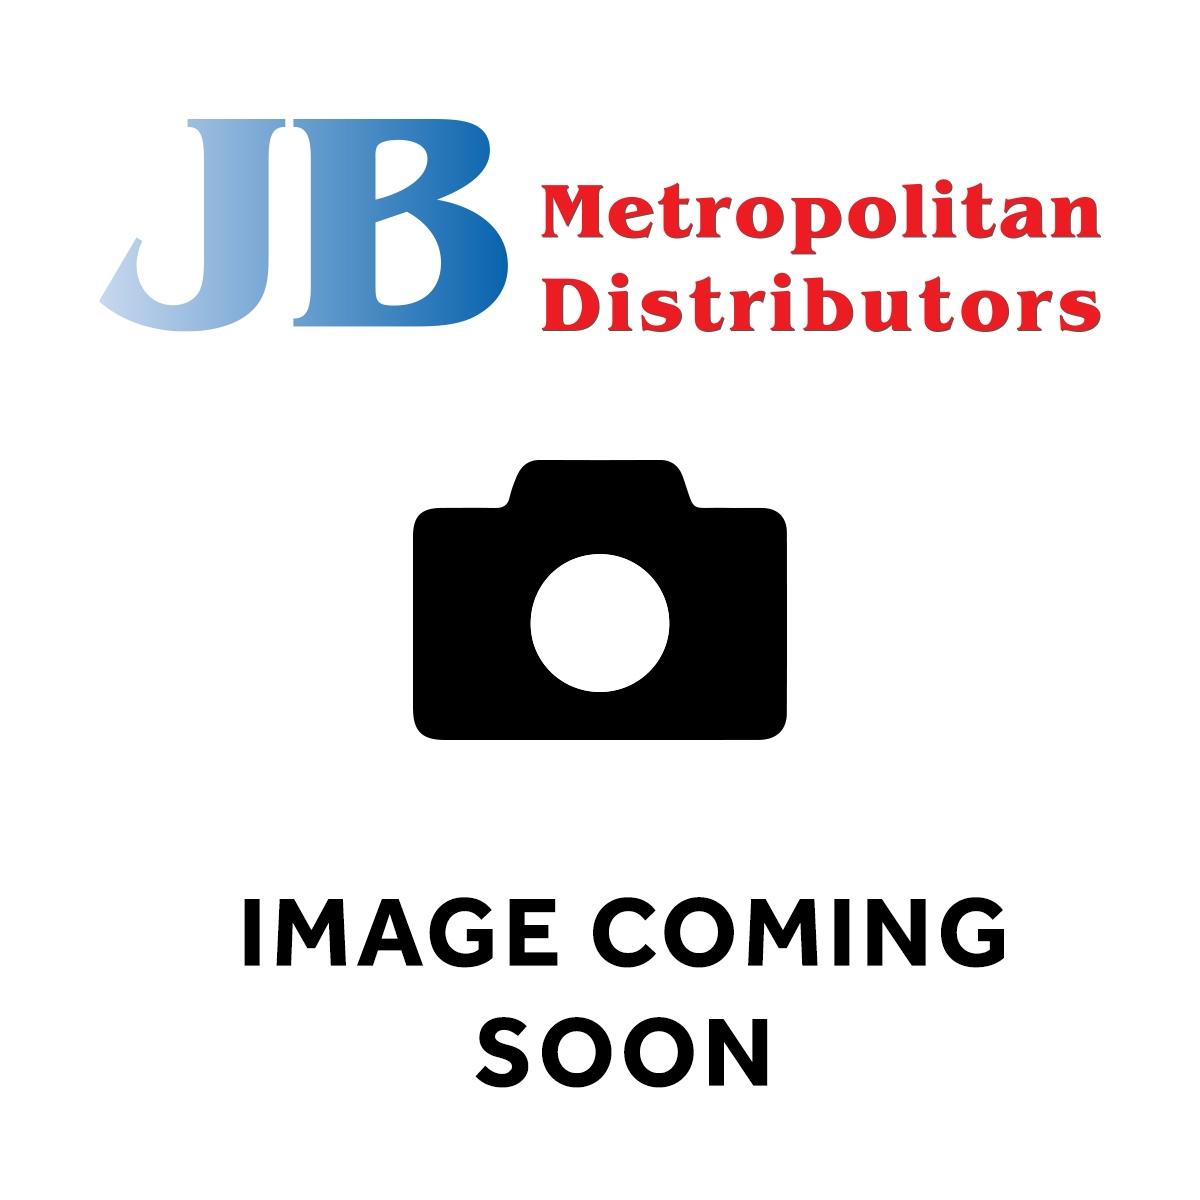 JEEERKS CHILLI HARD BEEF JERKY 50G (15)